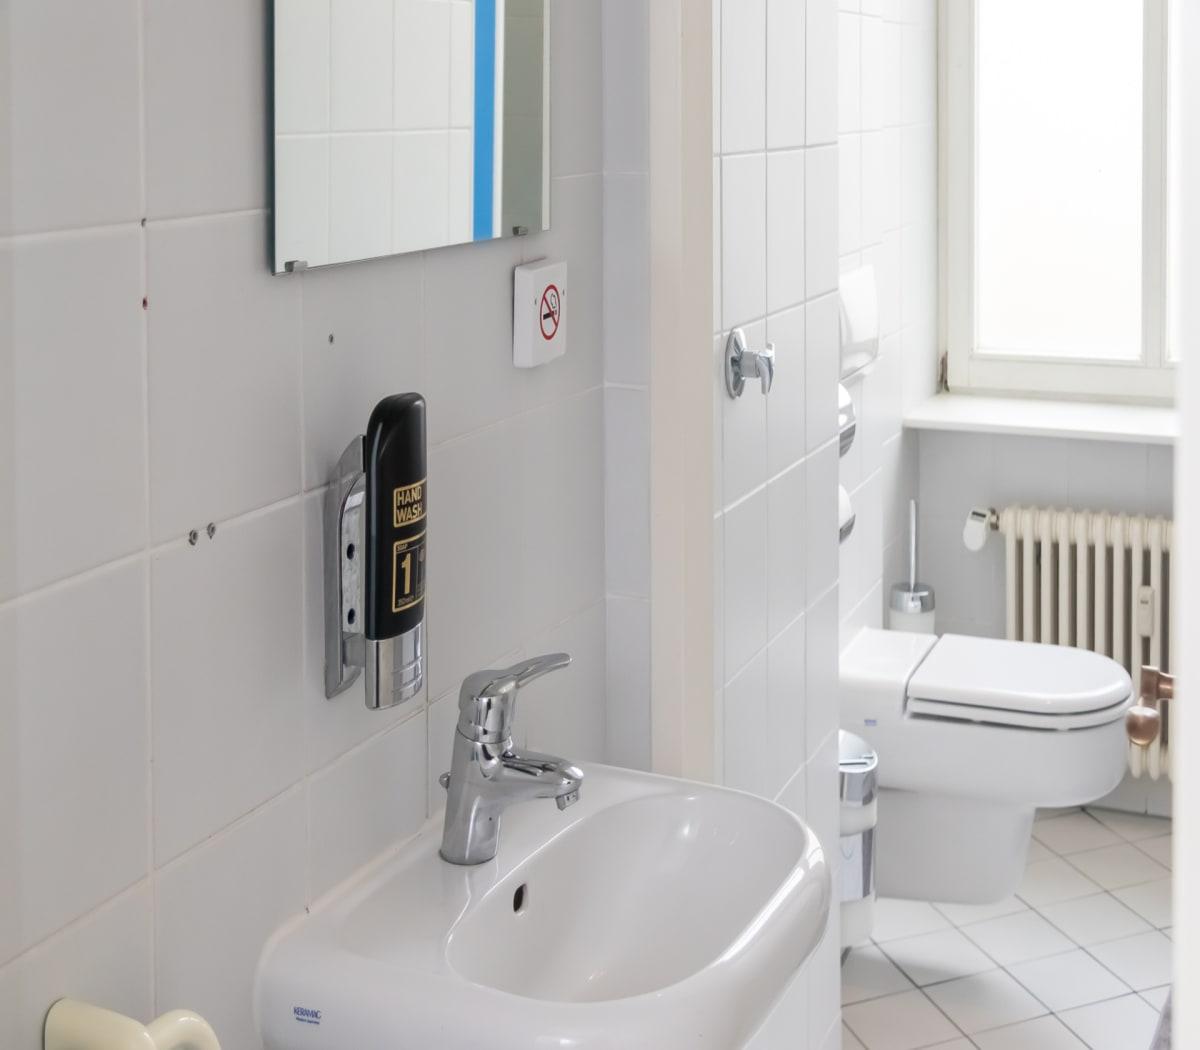 Pension Hostel StayComfort am Kurfürstendamm, Berlin, Germany